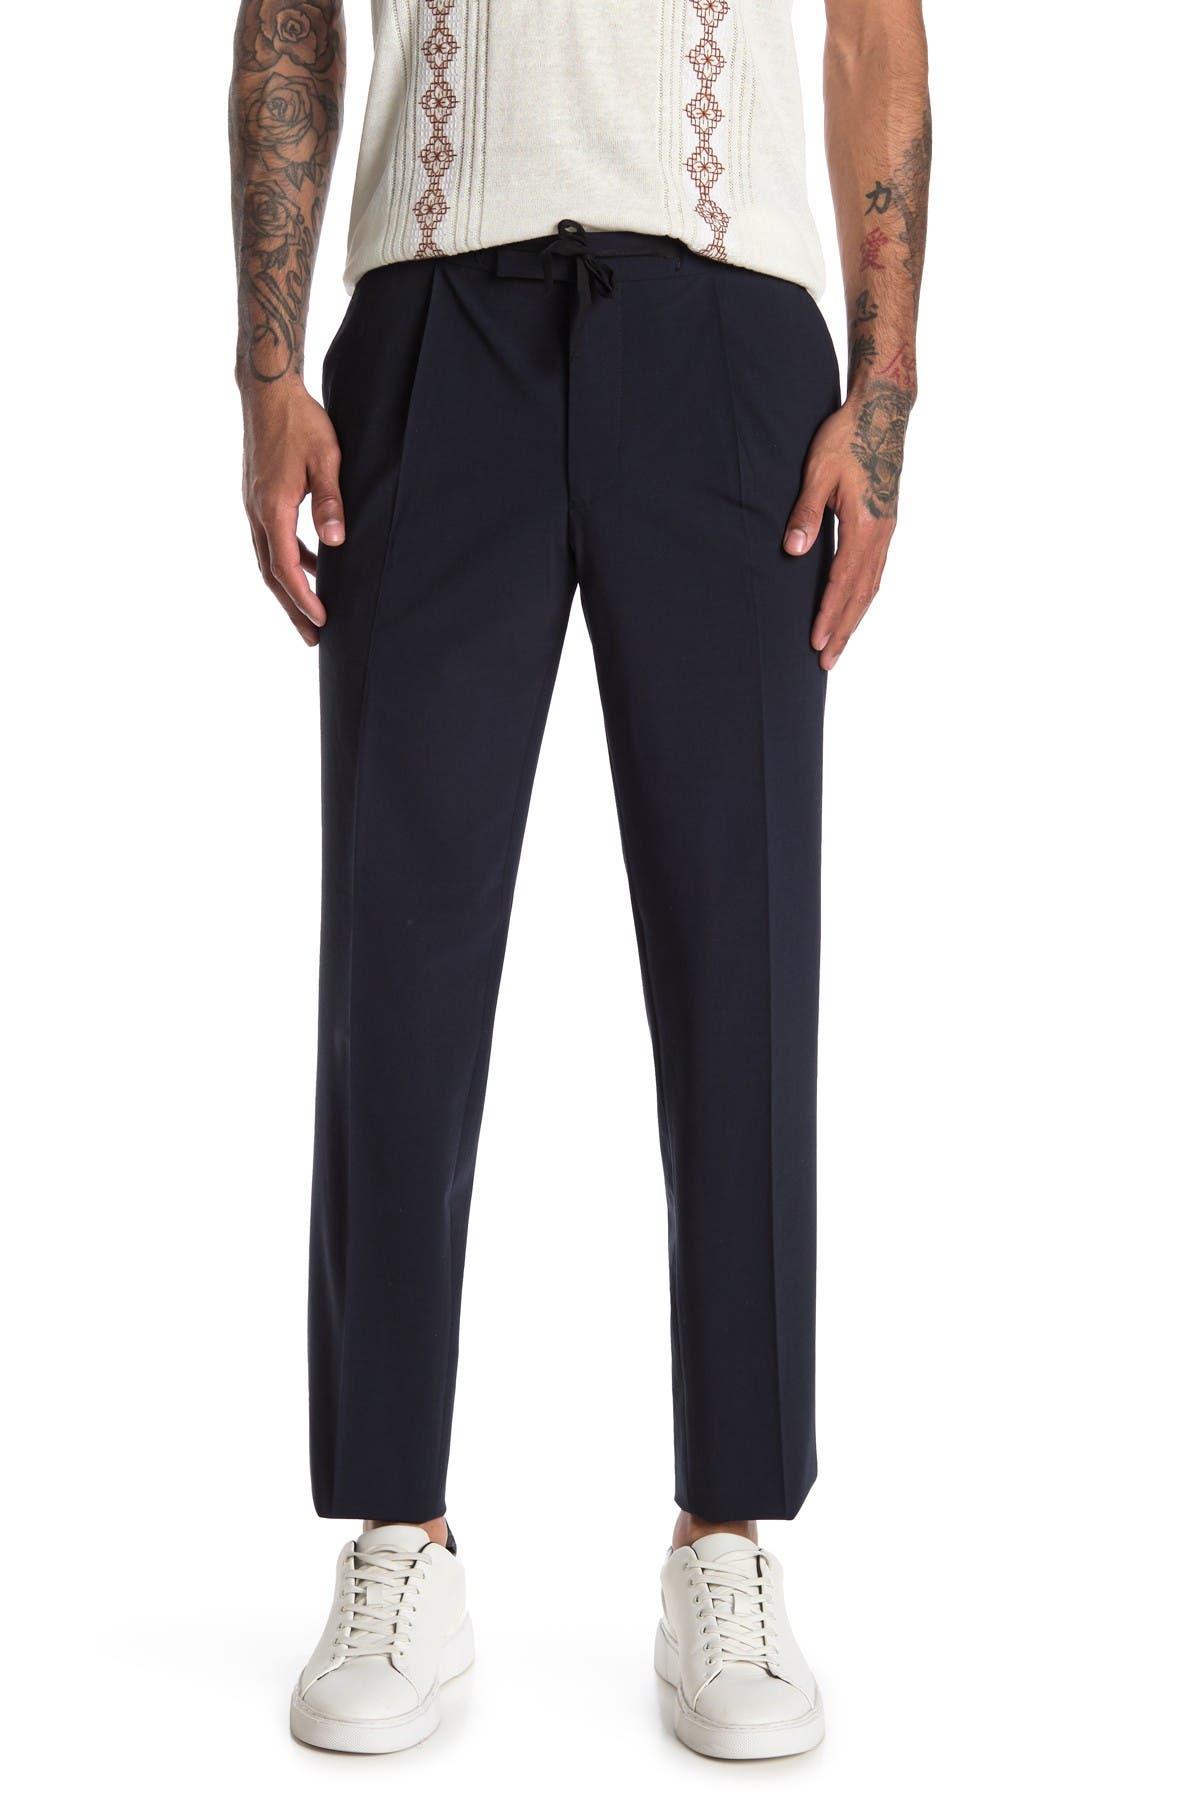 Image of REISS Baton Plain Weave Slim Dress Pants